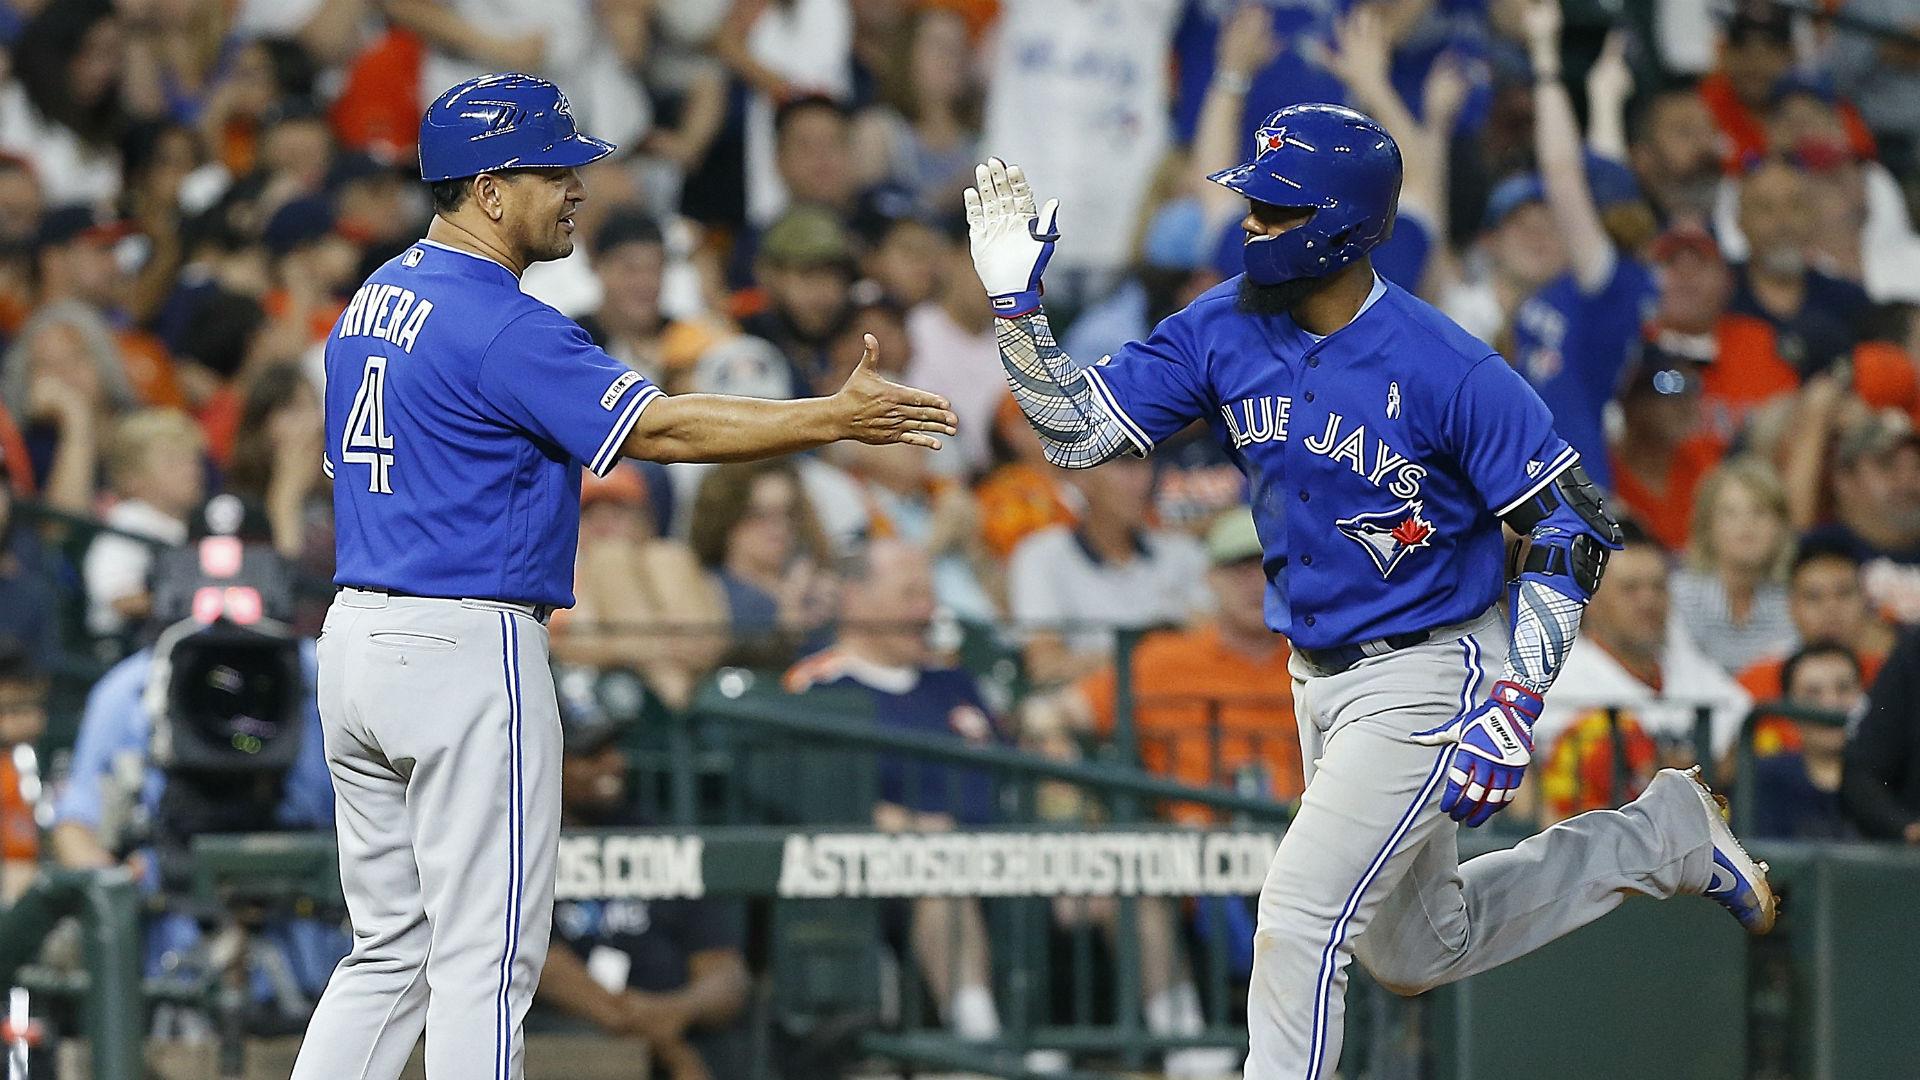 MLB wrap: Blue Jays hit season-high five home runs in 12-0 win over Astros